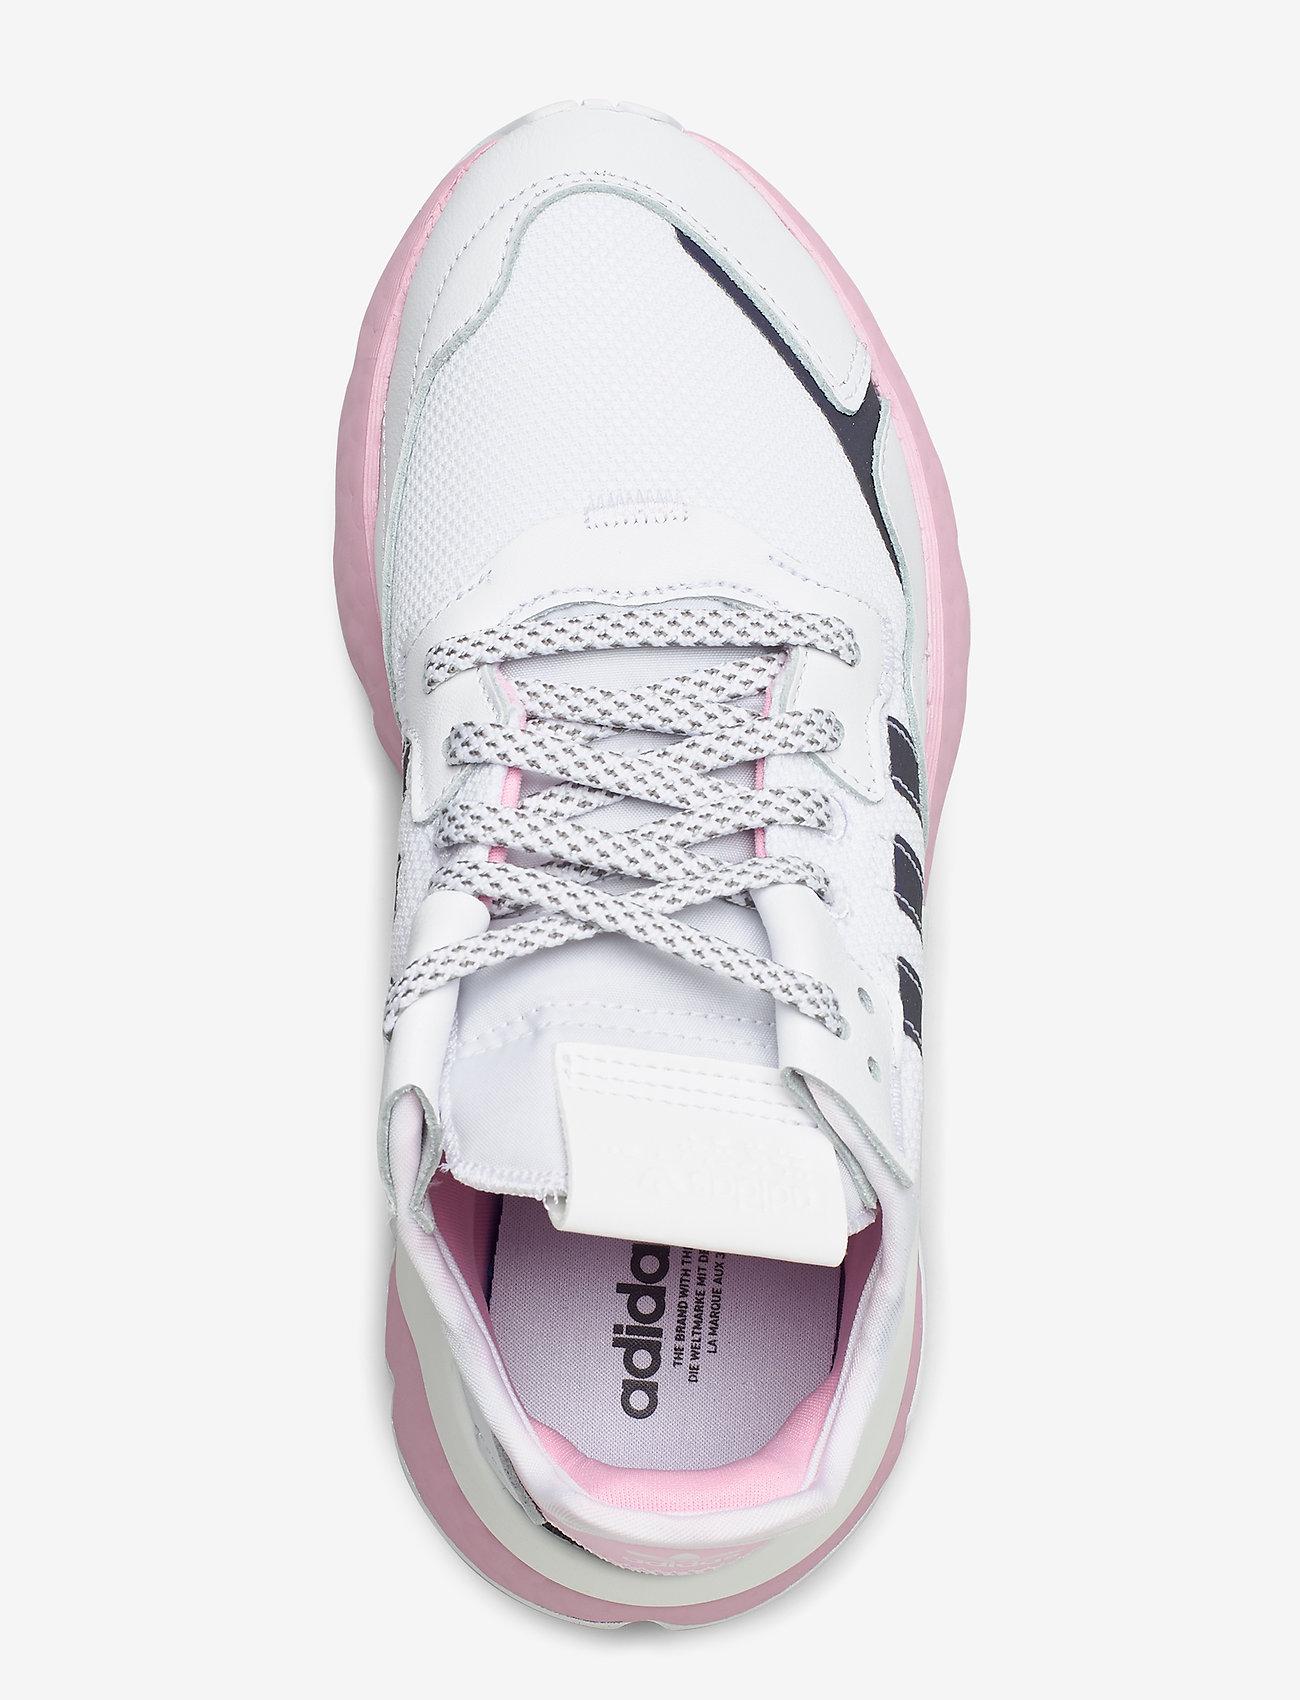 Nite Jogger W (Ftwwht/trupnk/cblack) - adidas Originals